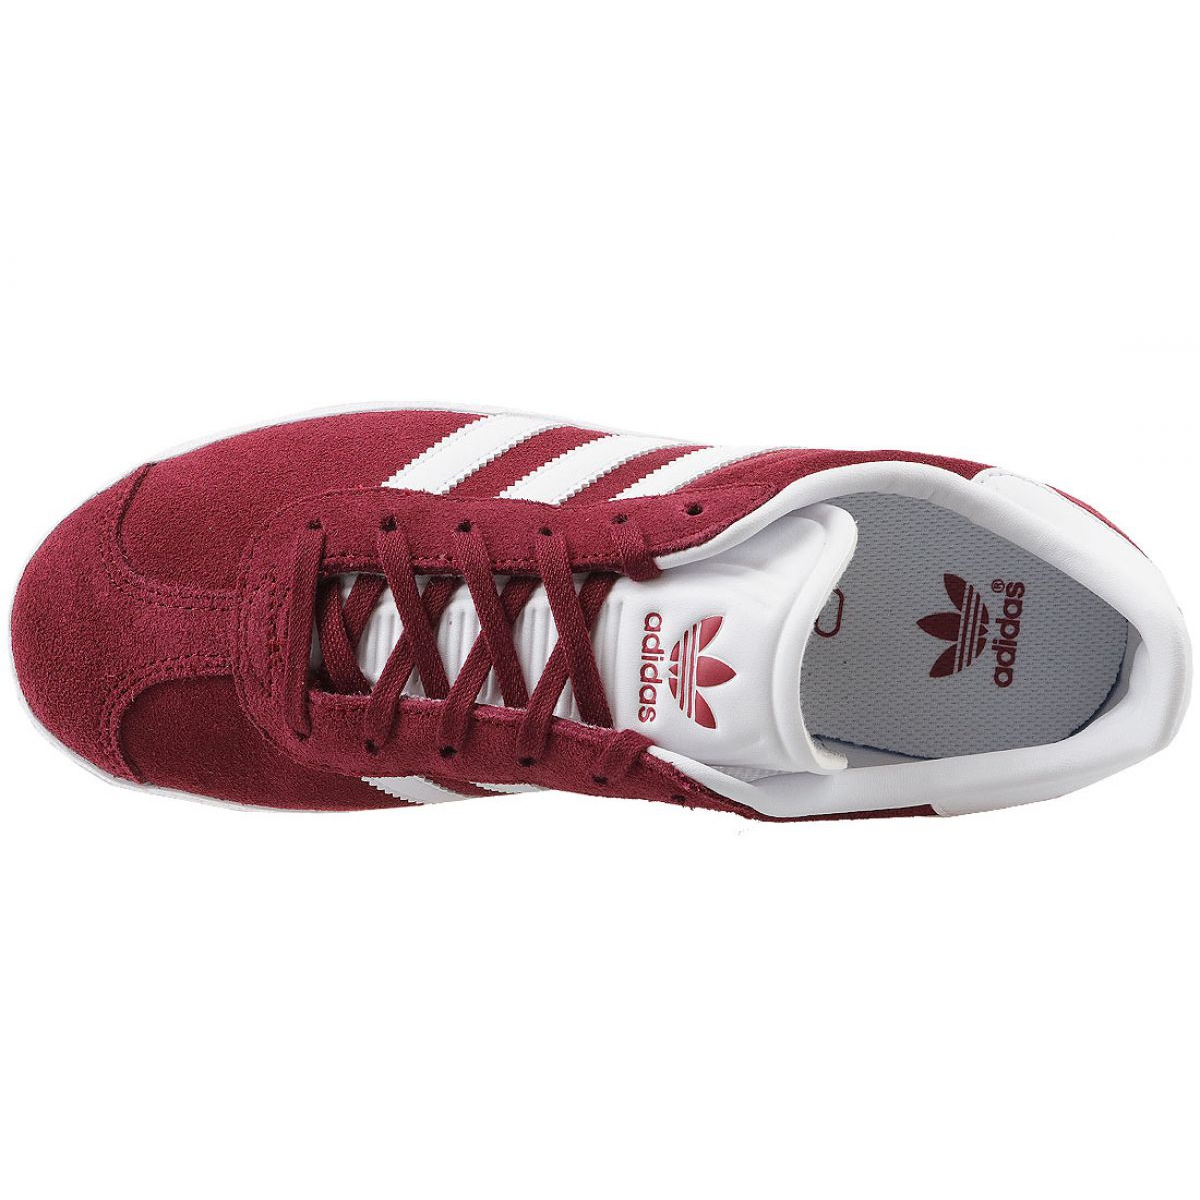 Adidas Gazelle Jr CQ2874 red shoes white - KeeShoes